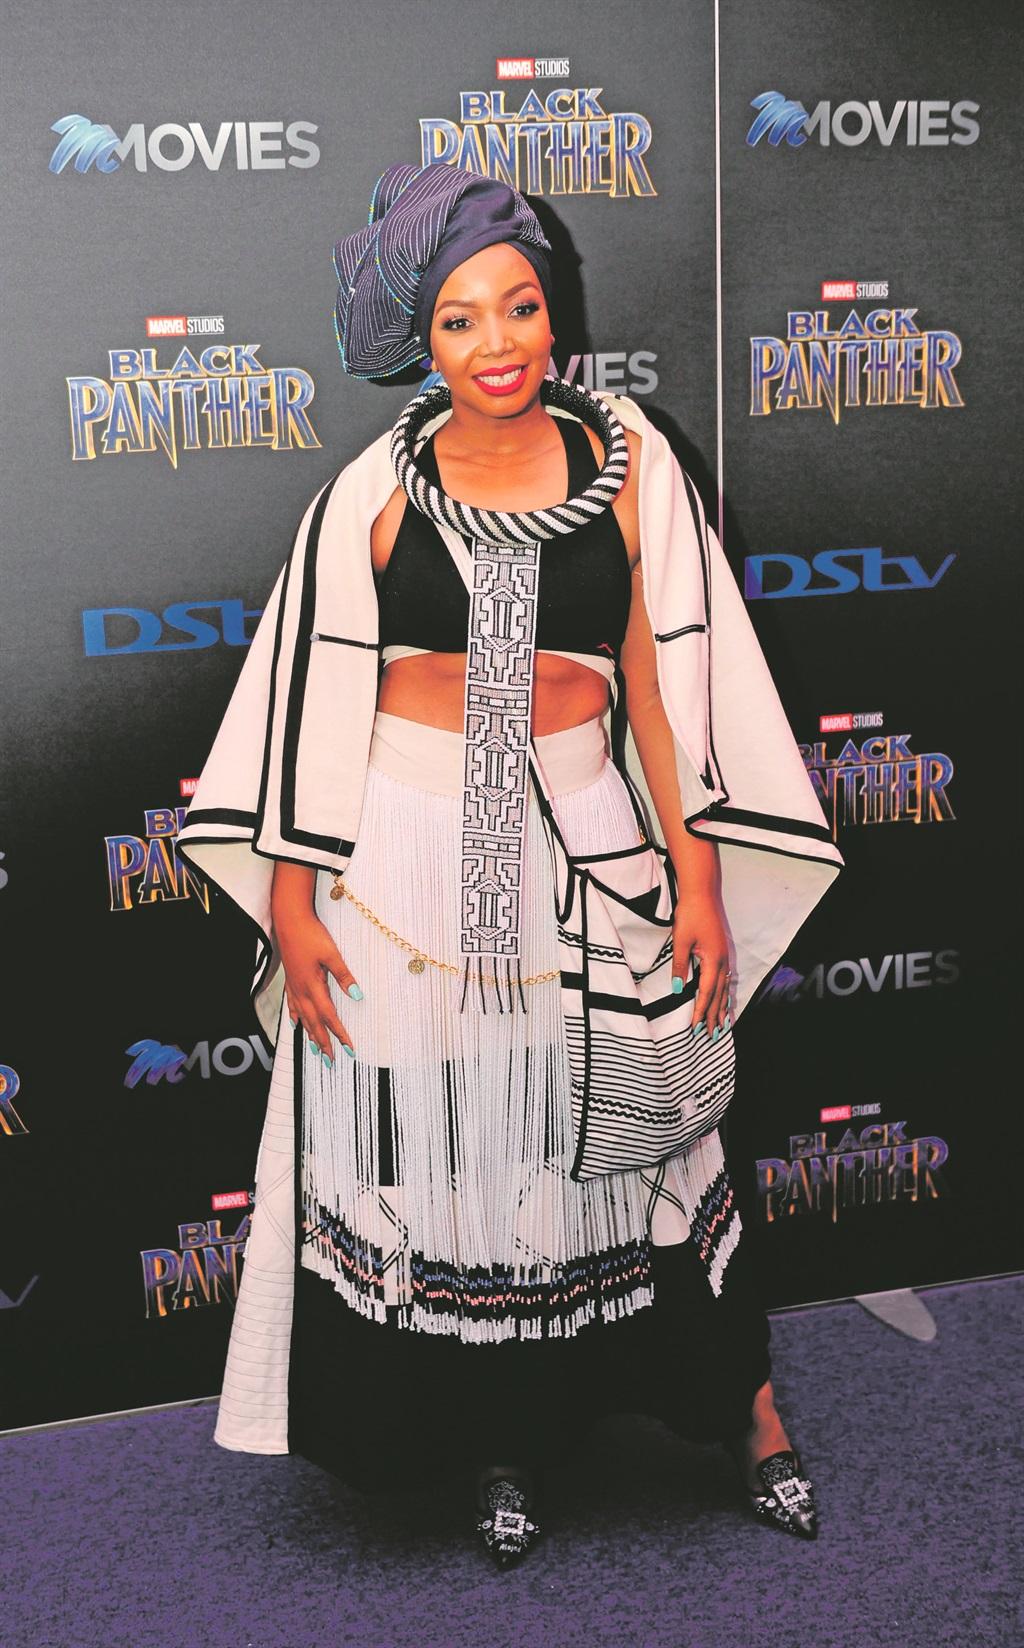 Sizzling fashion at Black Panther premiere